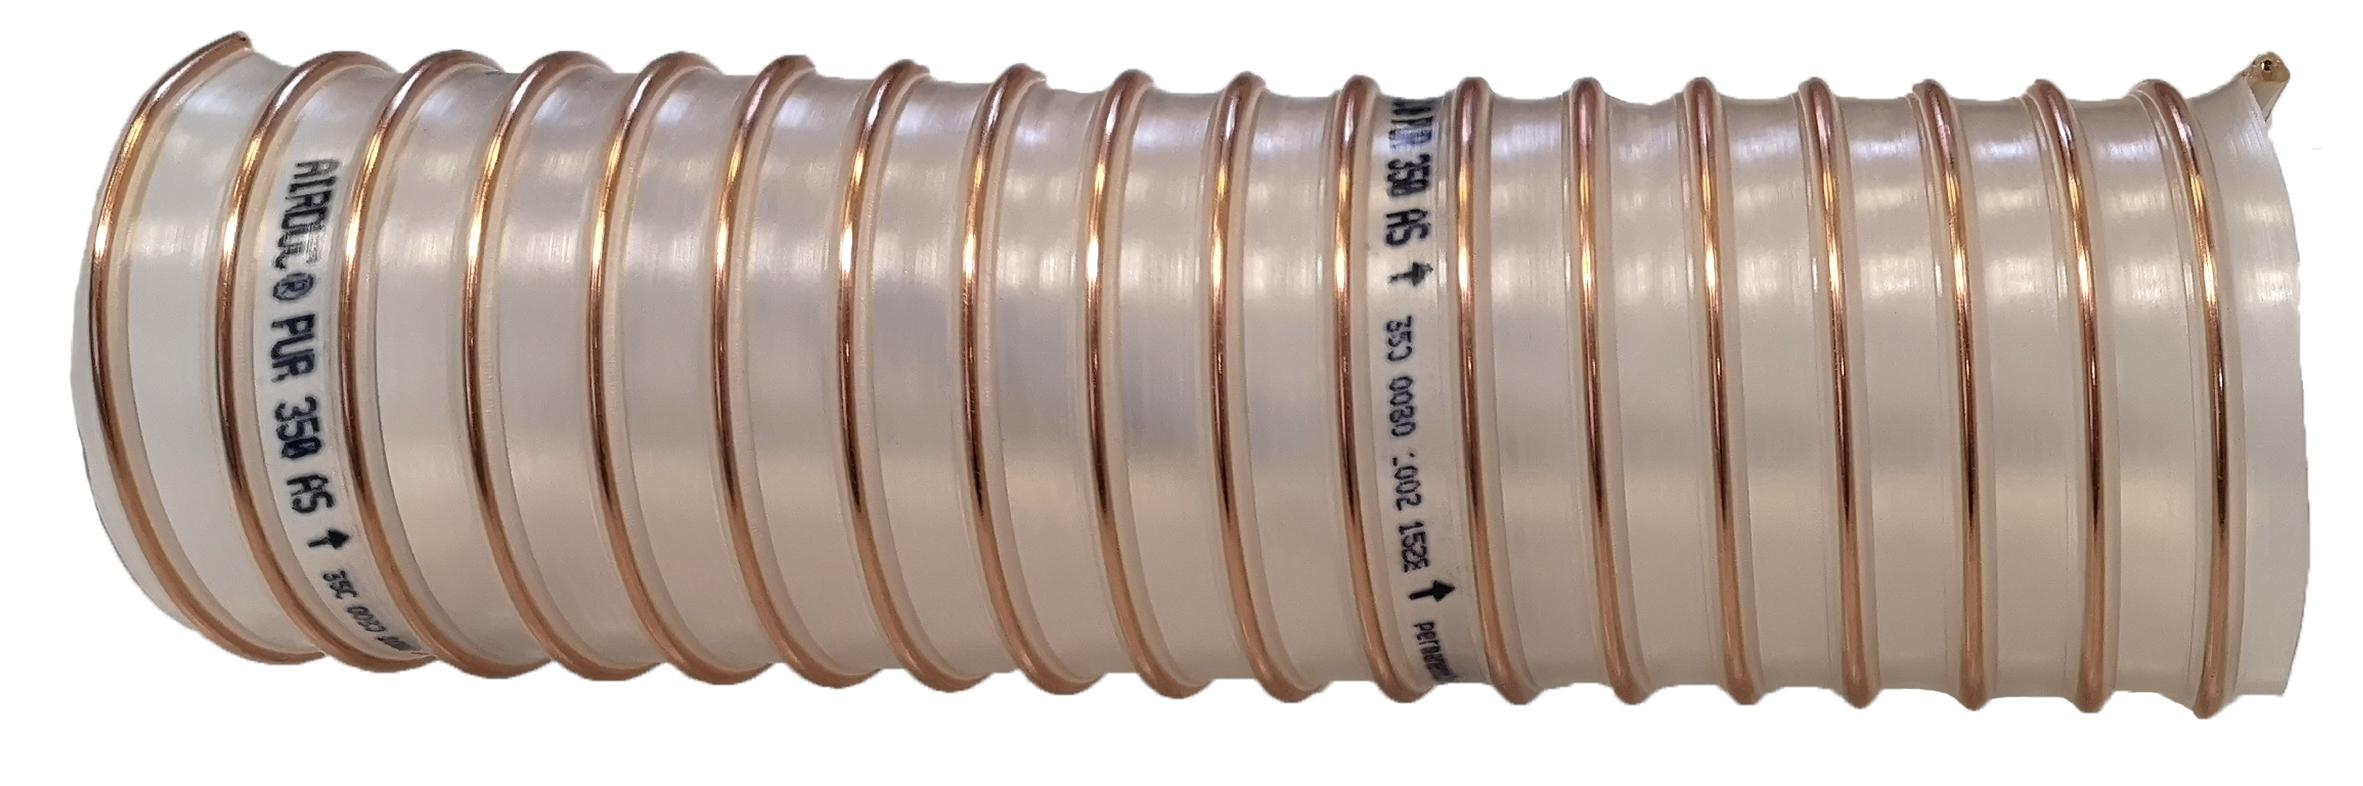 Brazed Diamond Grinding Head Torch Cylindrical for Jade Peeling Golden Head Diameter : 4mm//5mm//6mm//8mm//10mm 6mm